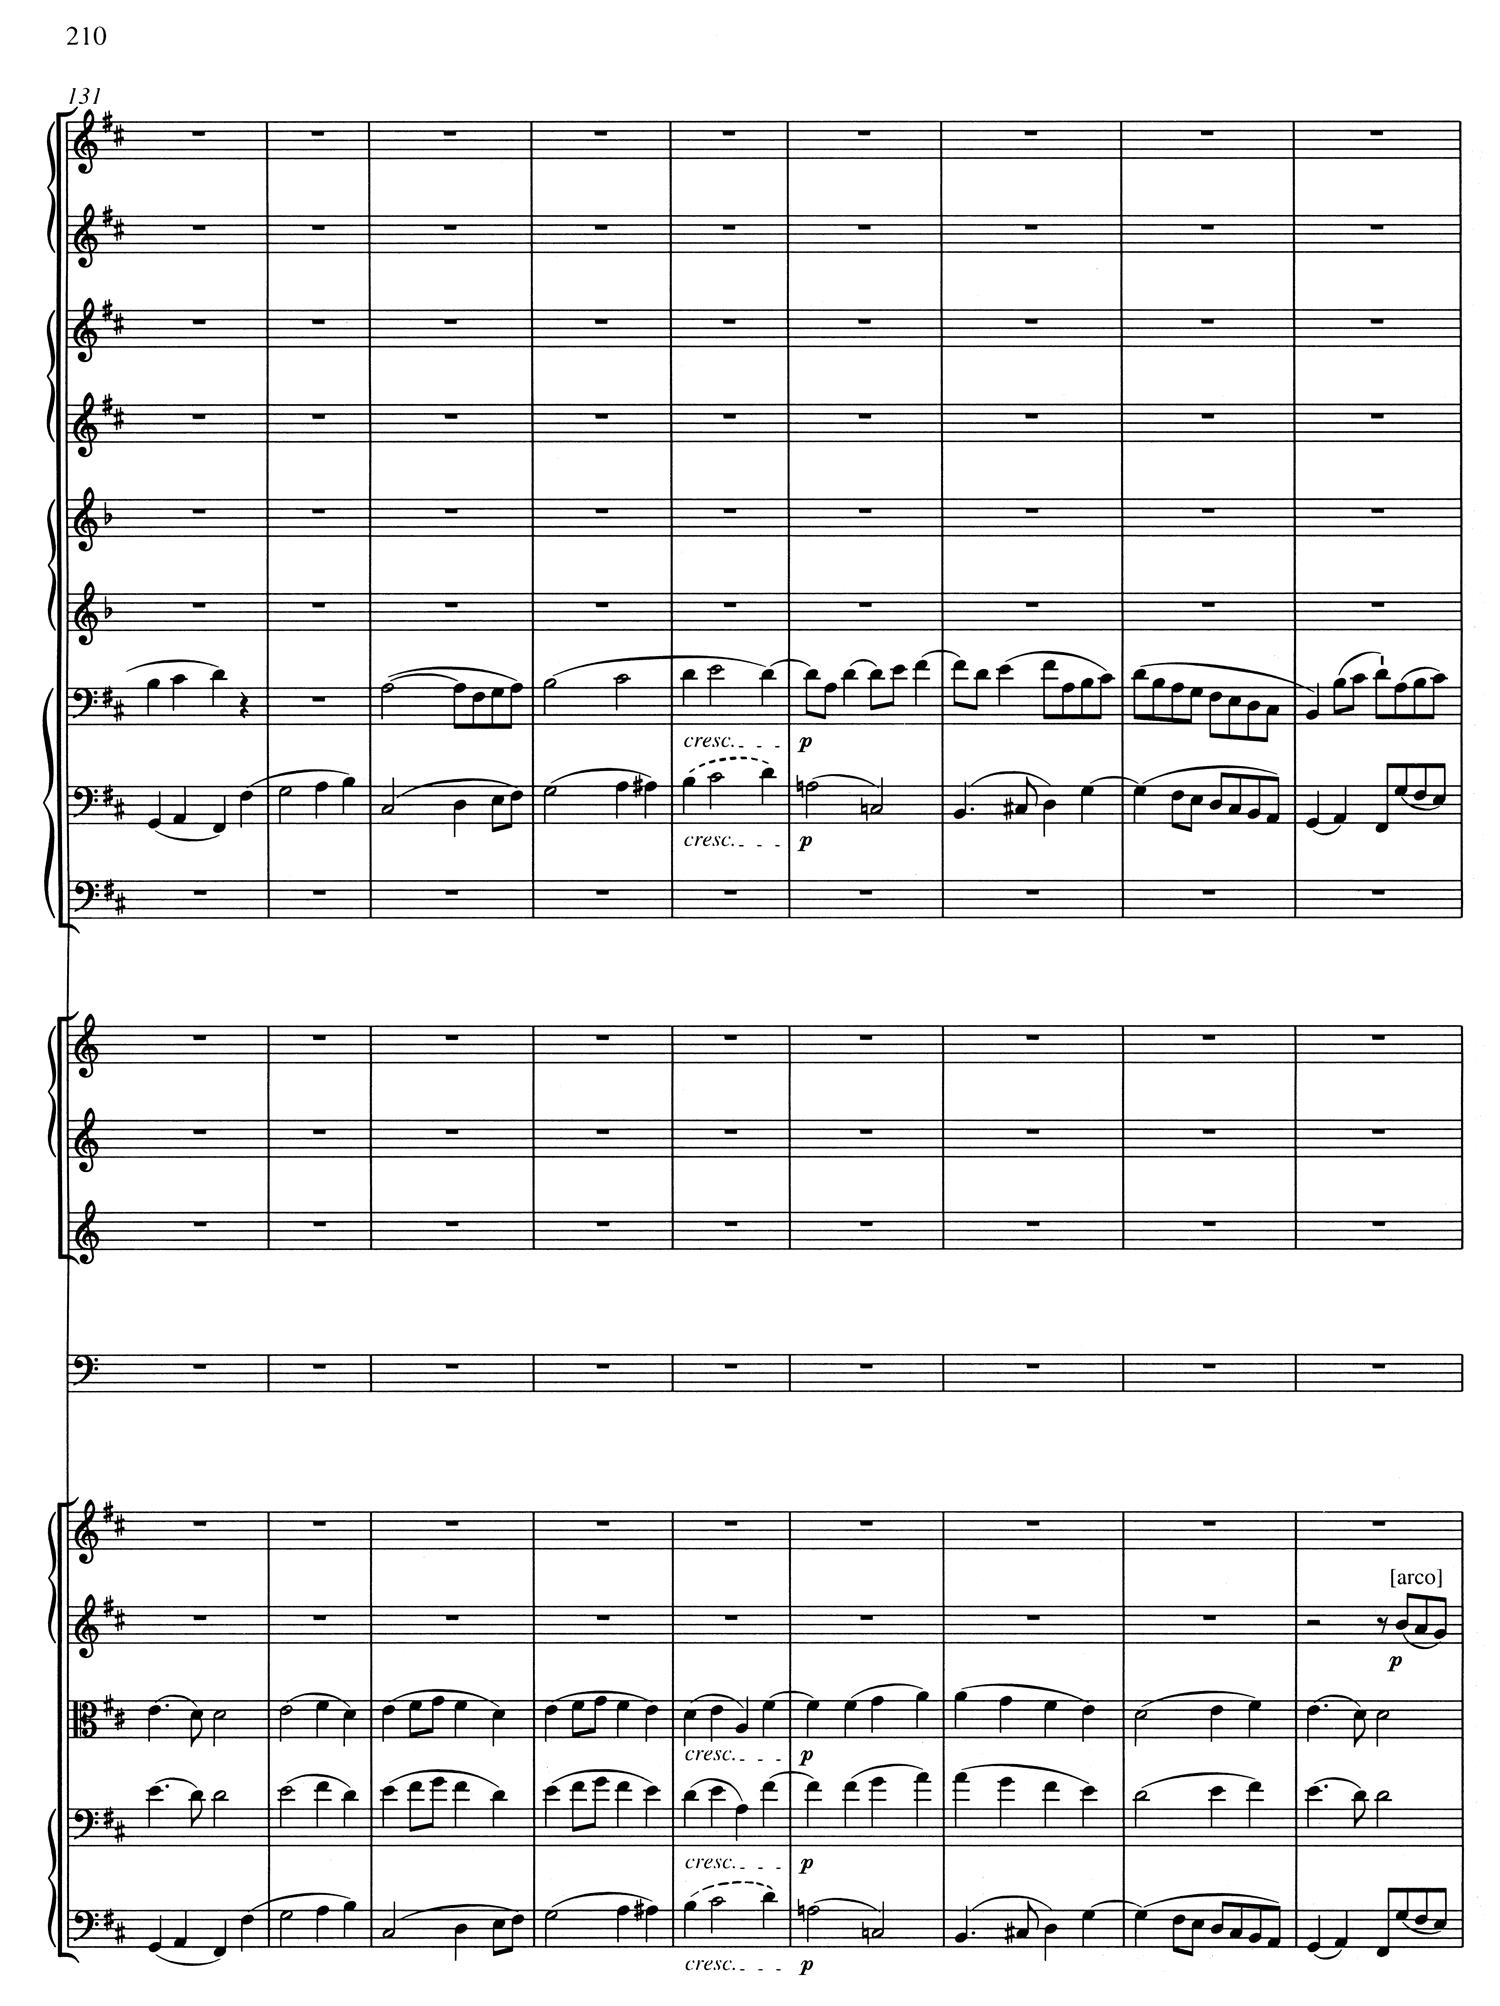 Beethoven 9 Bsn Score 3.jpg